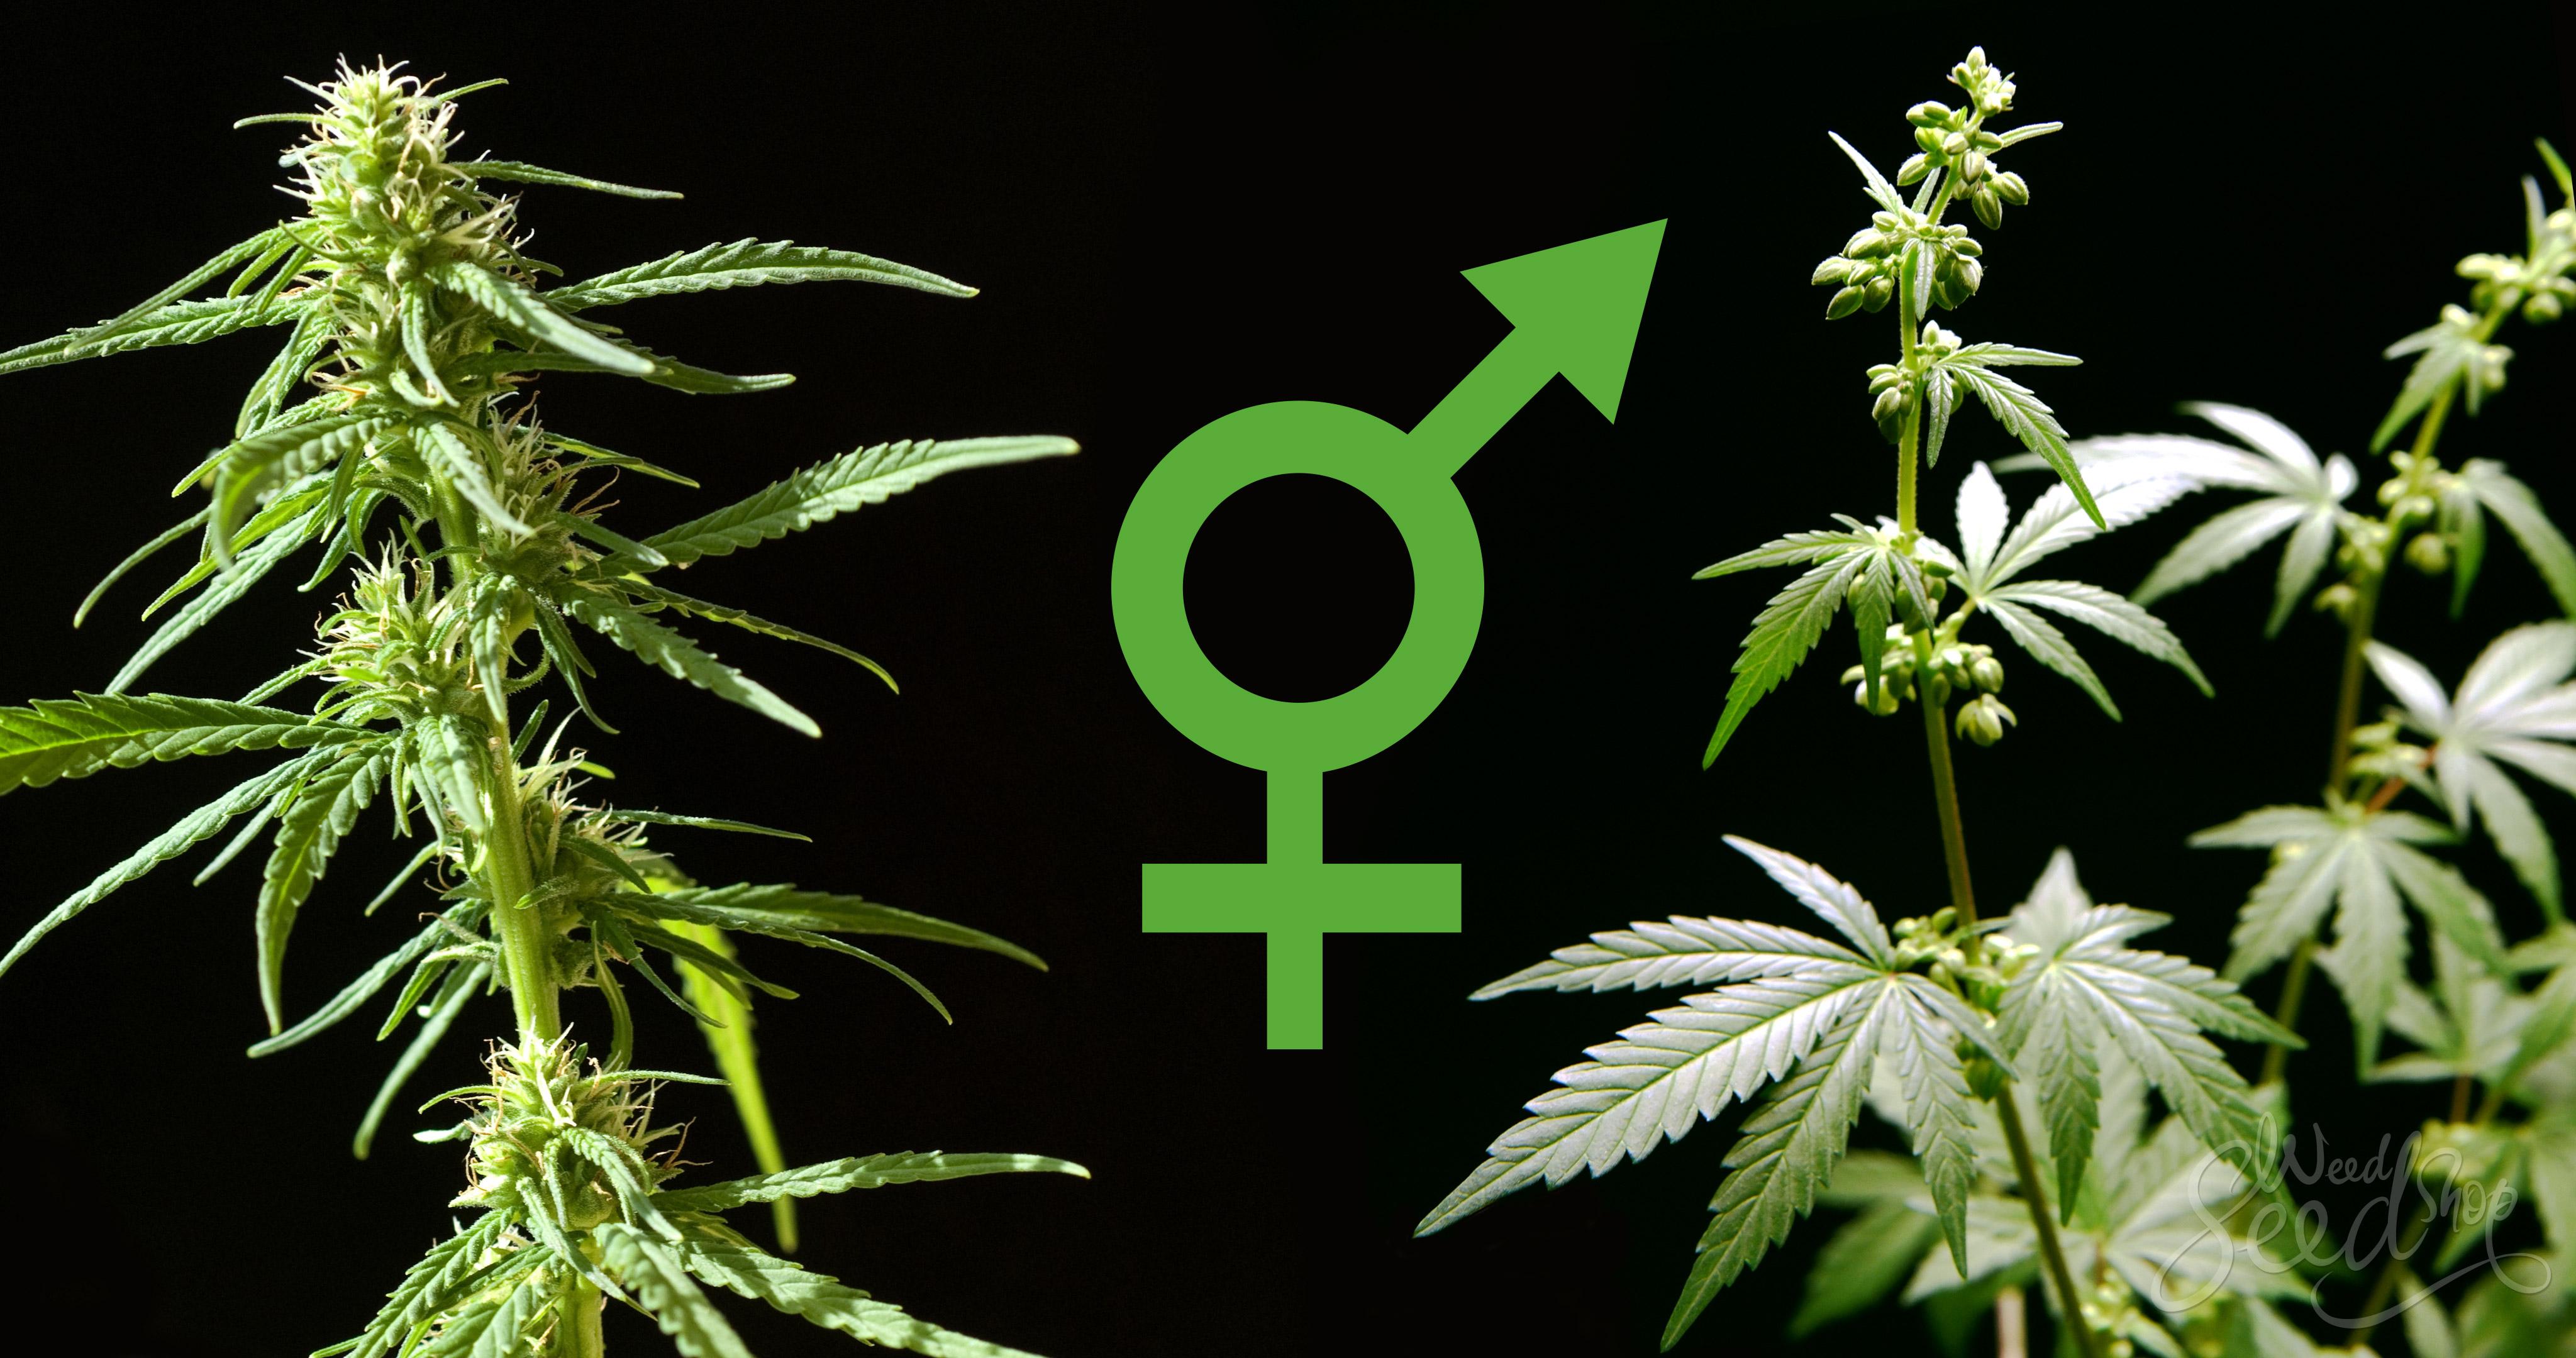 Cómo saber si tu planta de marihuana es femenina o masculina